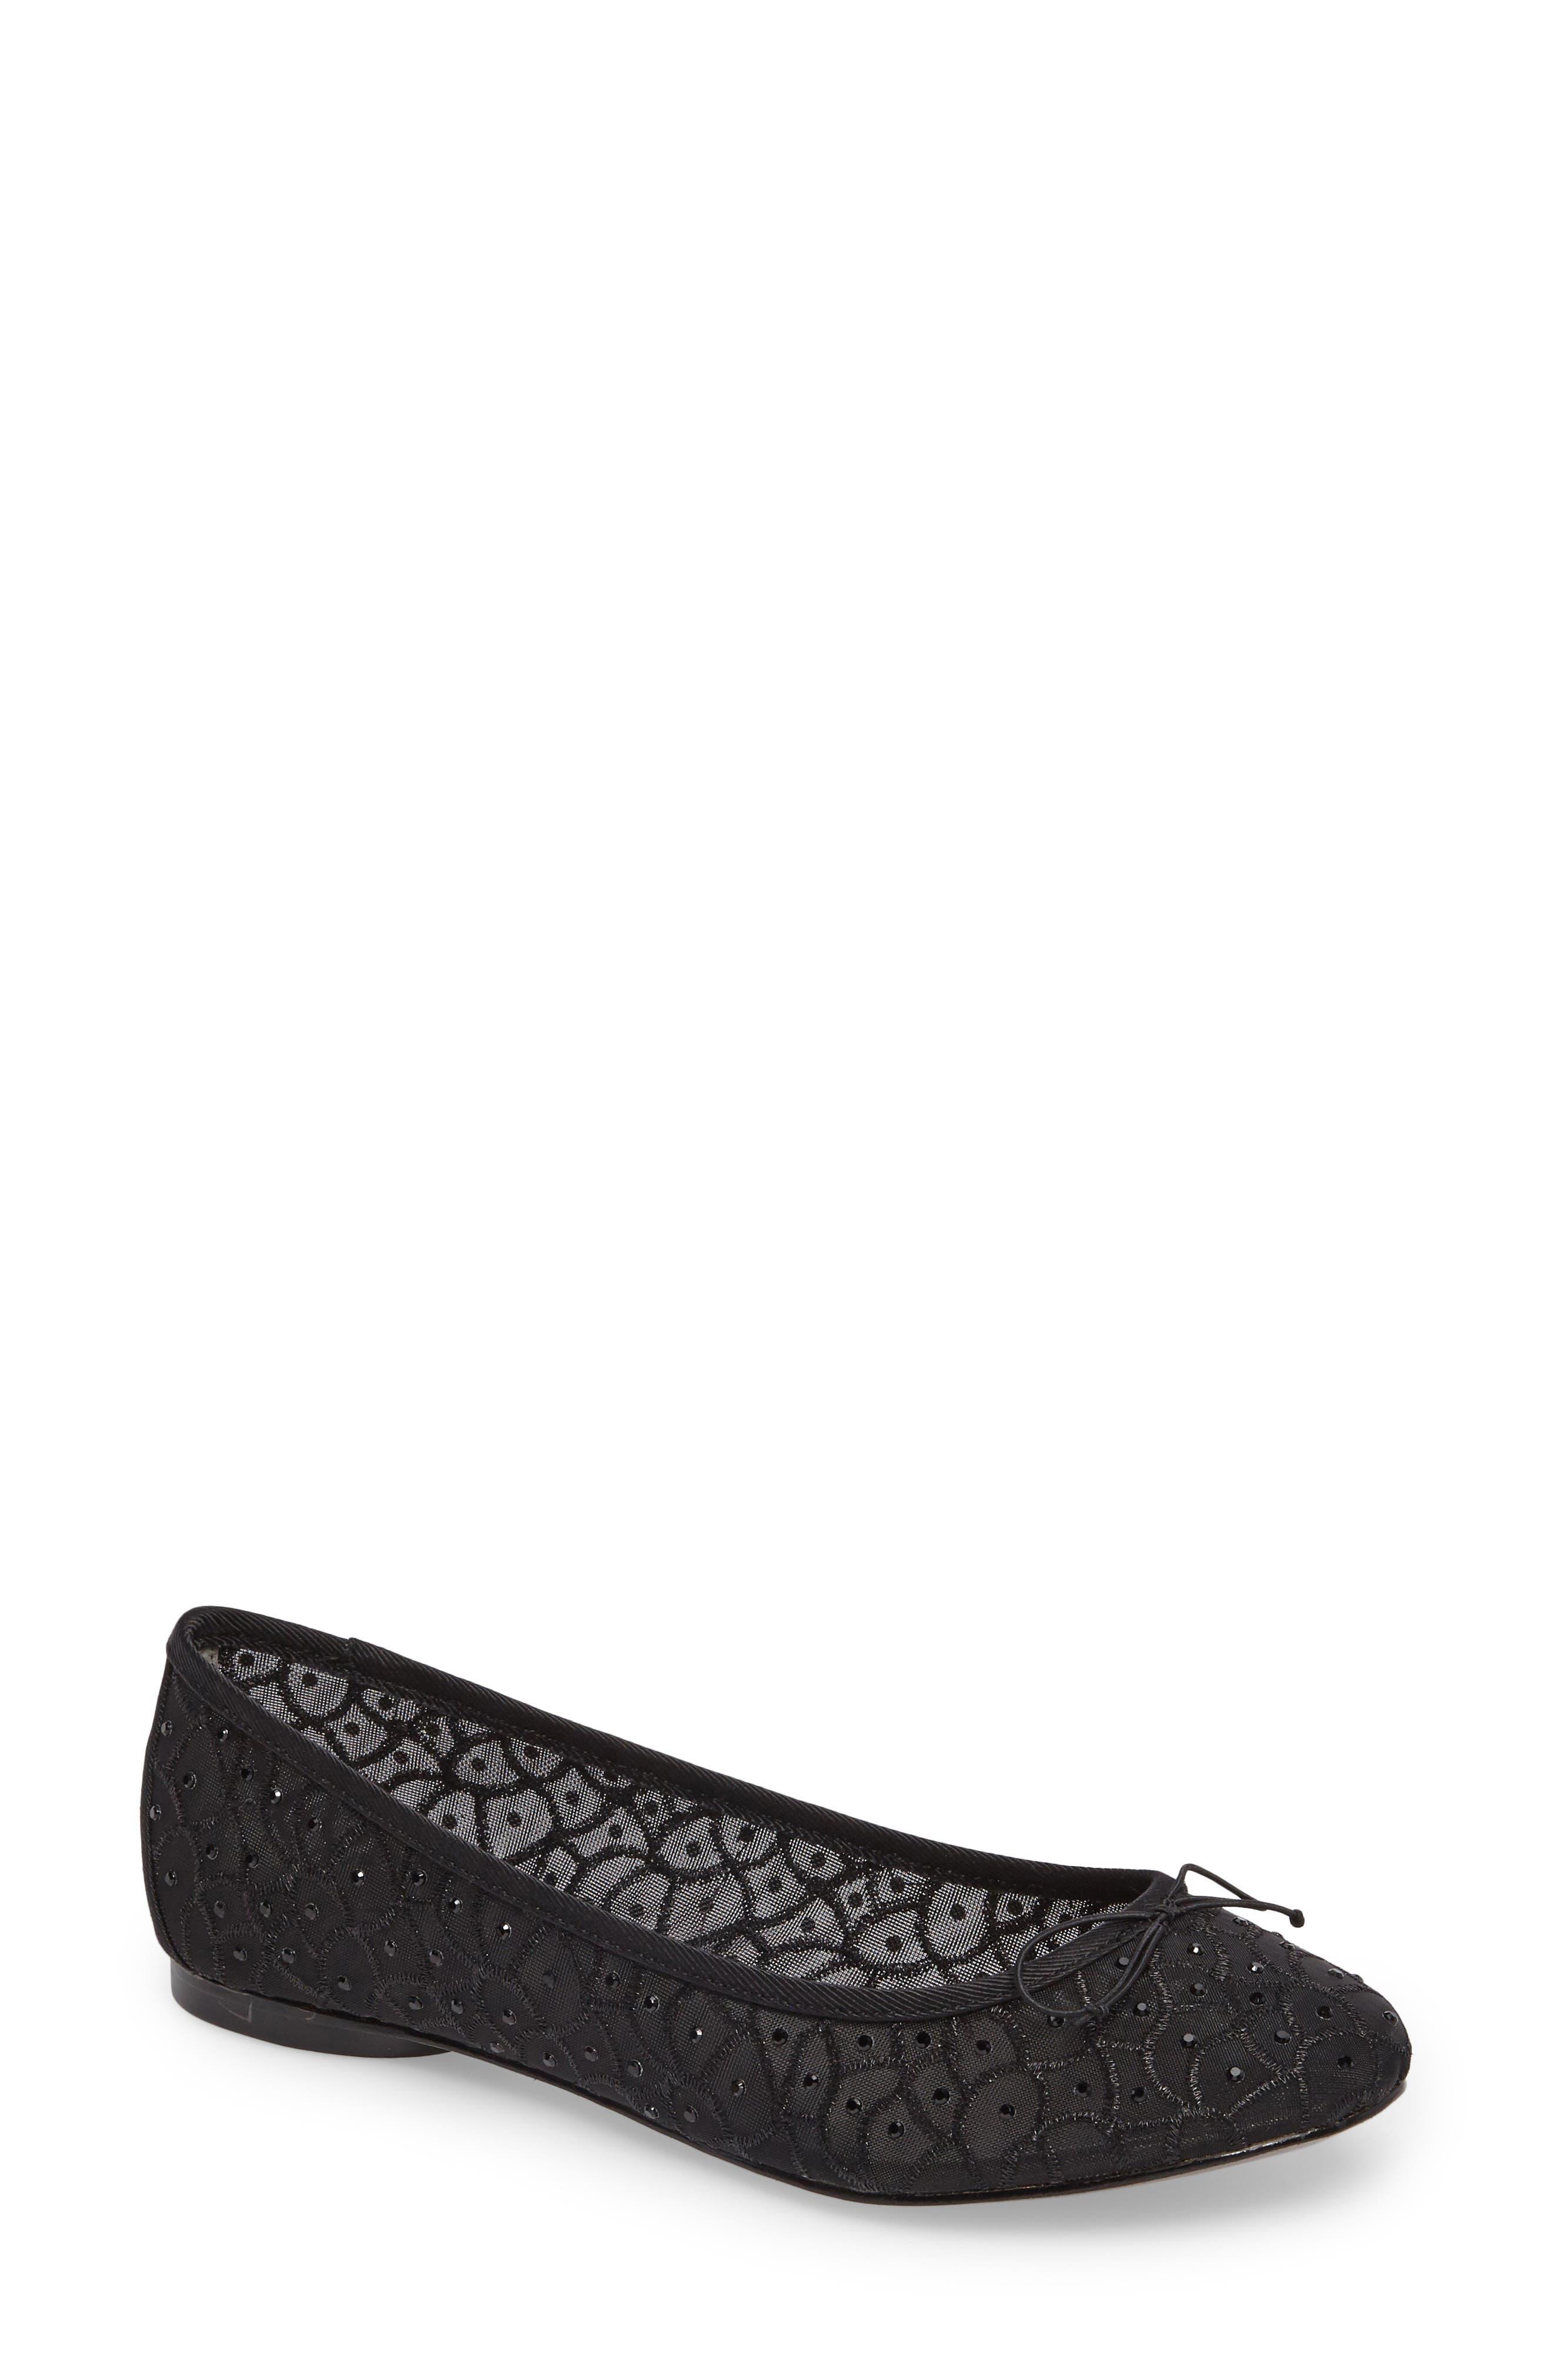 Natalia Ballet Flat,                             Main thumbnail 1, color,                             Black Fabric